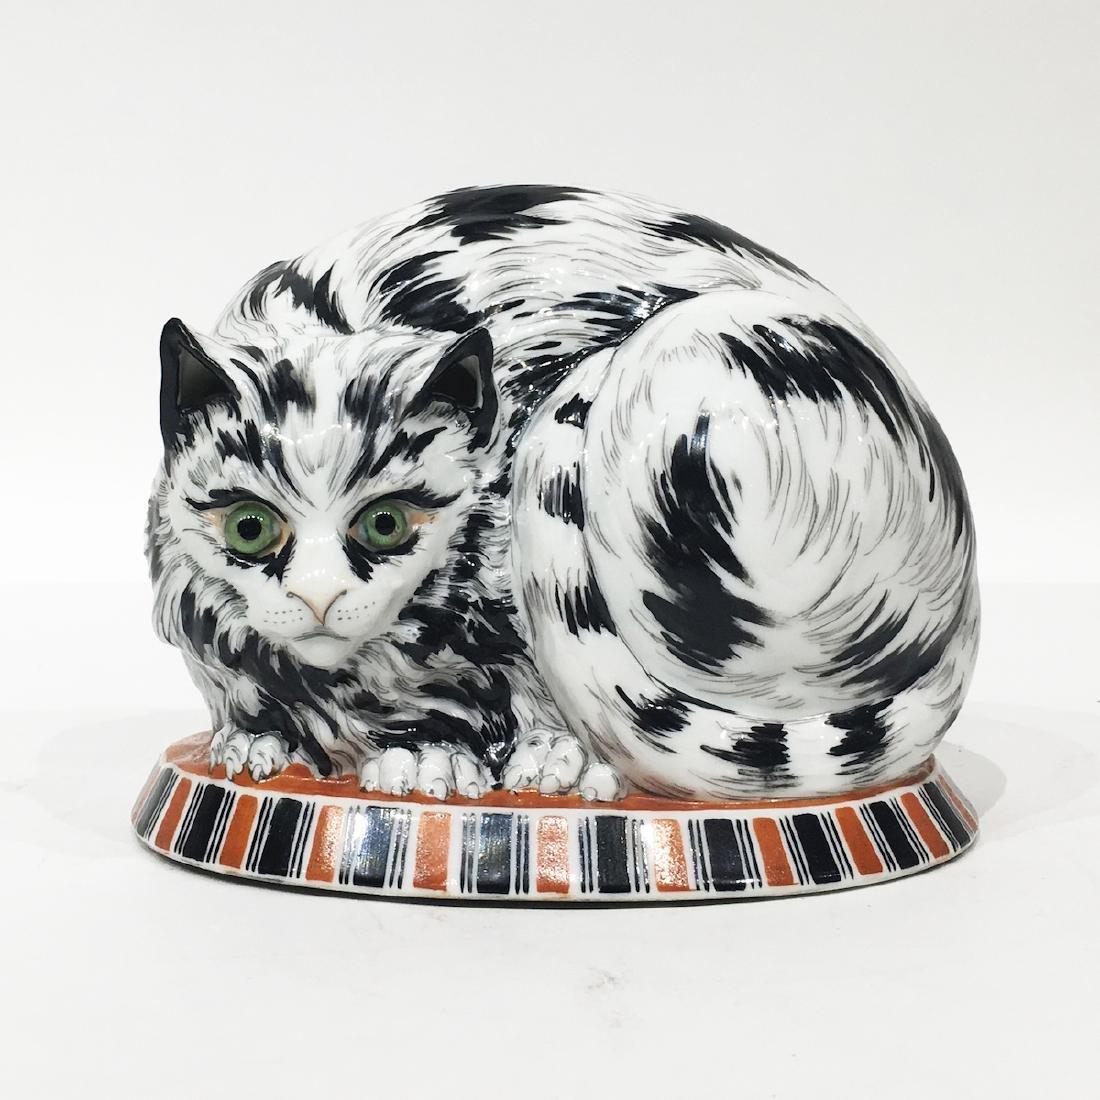 German Porcelain Cat lamp, marked